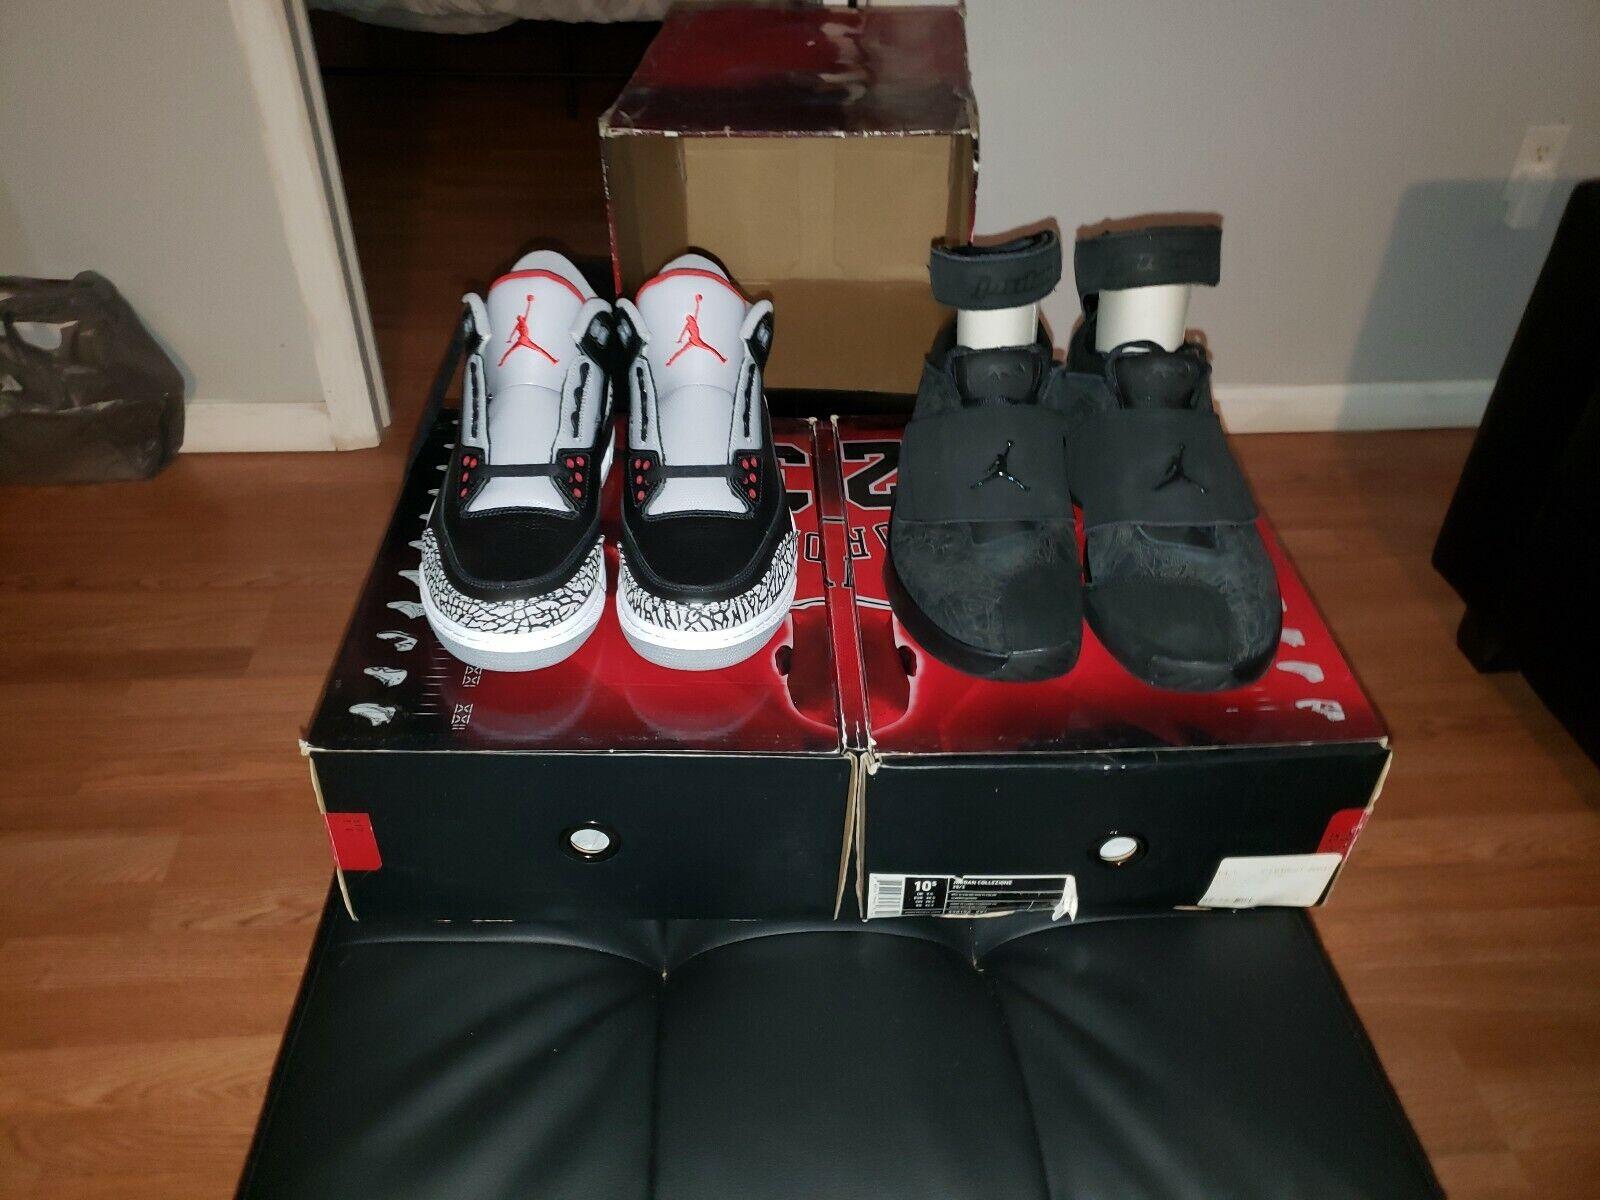 b66332f317a3b7 Nike Air Jordan Jordan Jordan Collezione 20 3 CDP Countdown Pack Size 8  Retro 3 XX